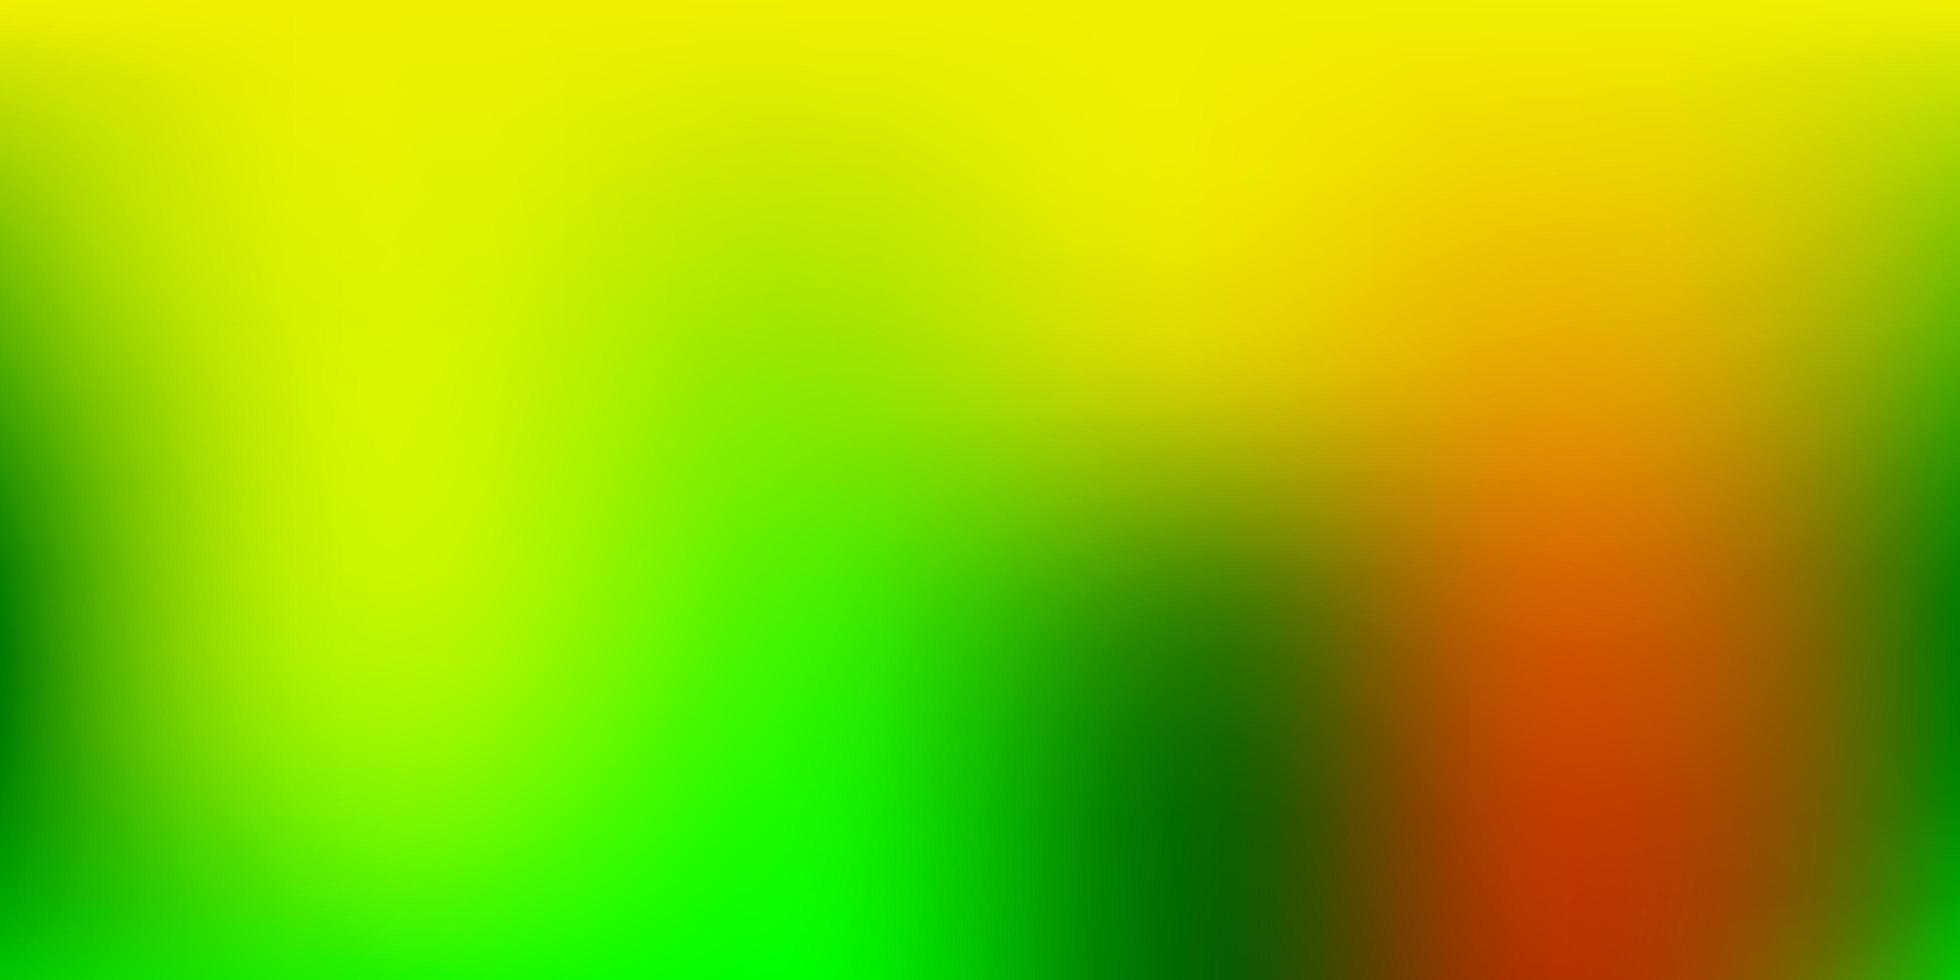 Light Green, Yellow blurred pattern. vector